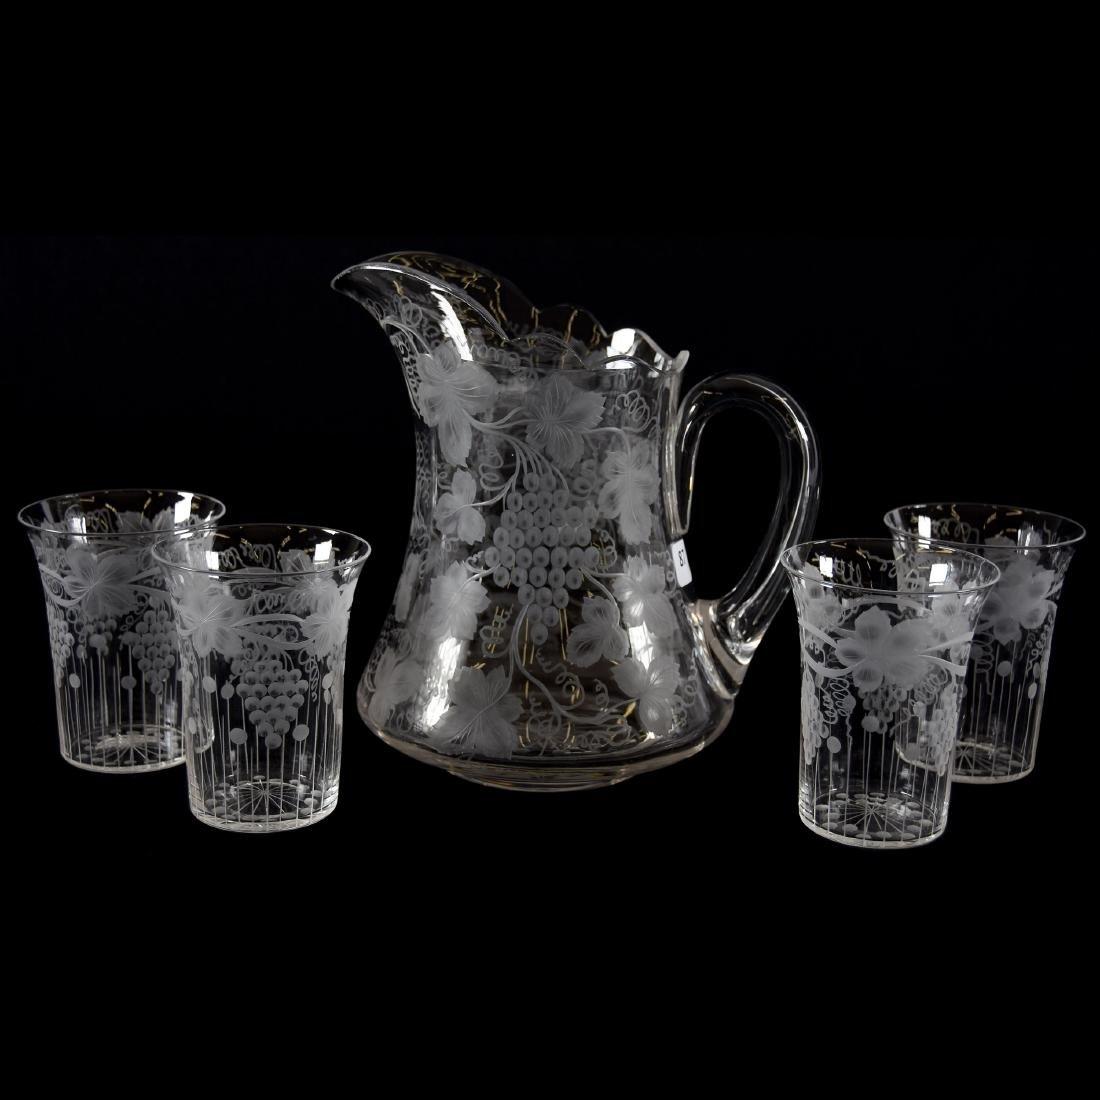 Water Set, Signed Hawkes, Engraved Vintage Motif